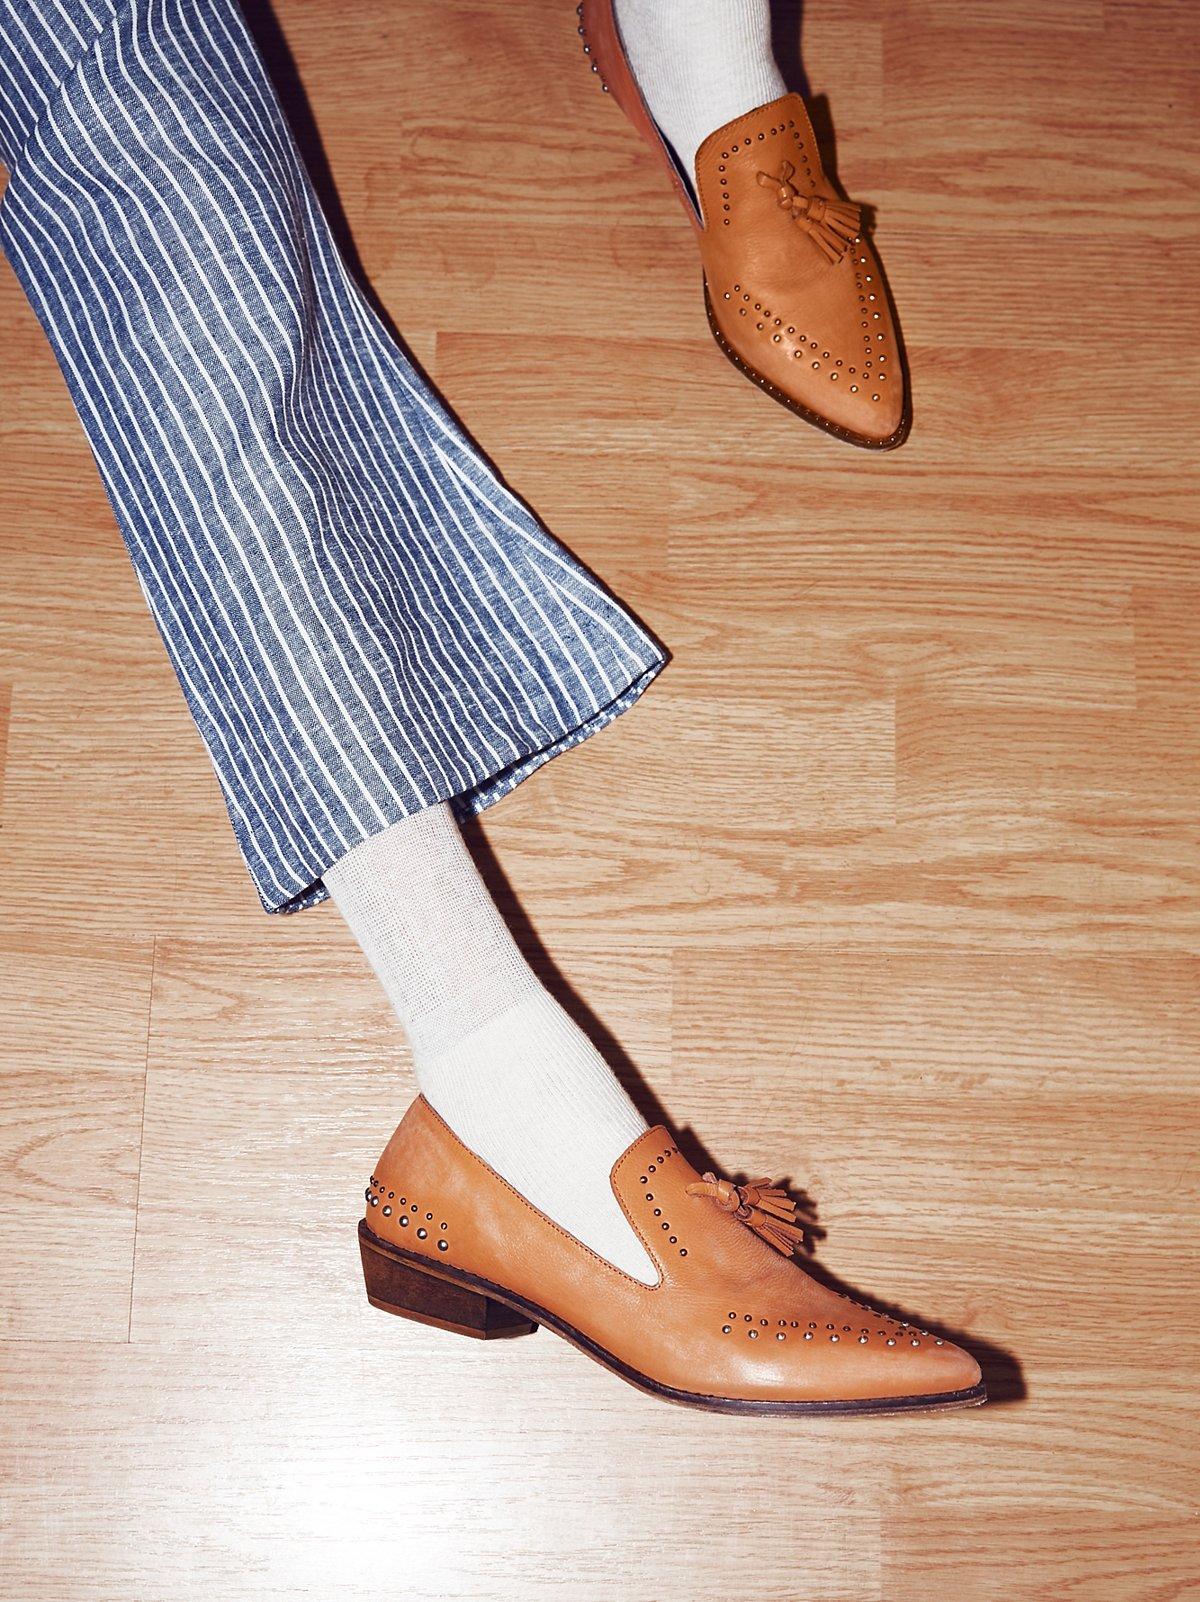 Rangley乐福鞋